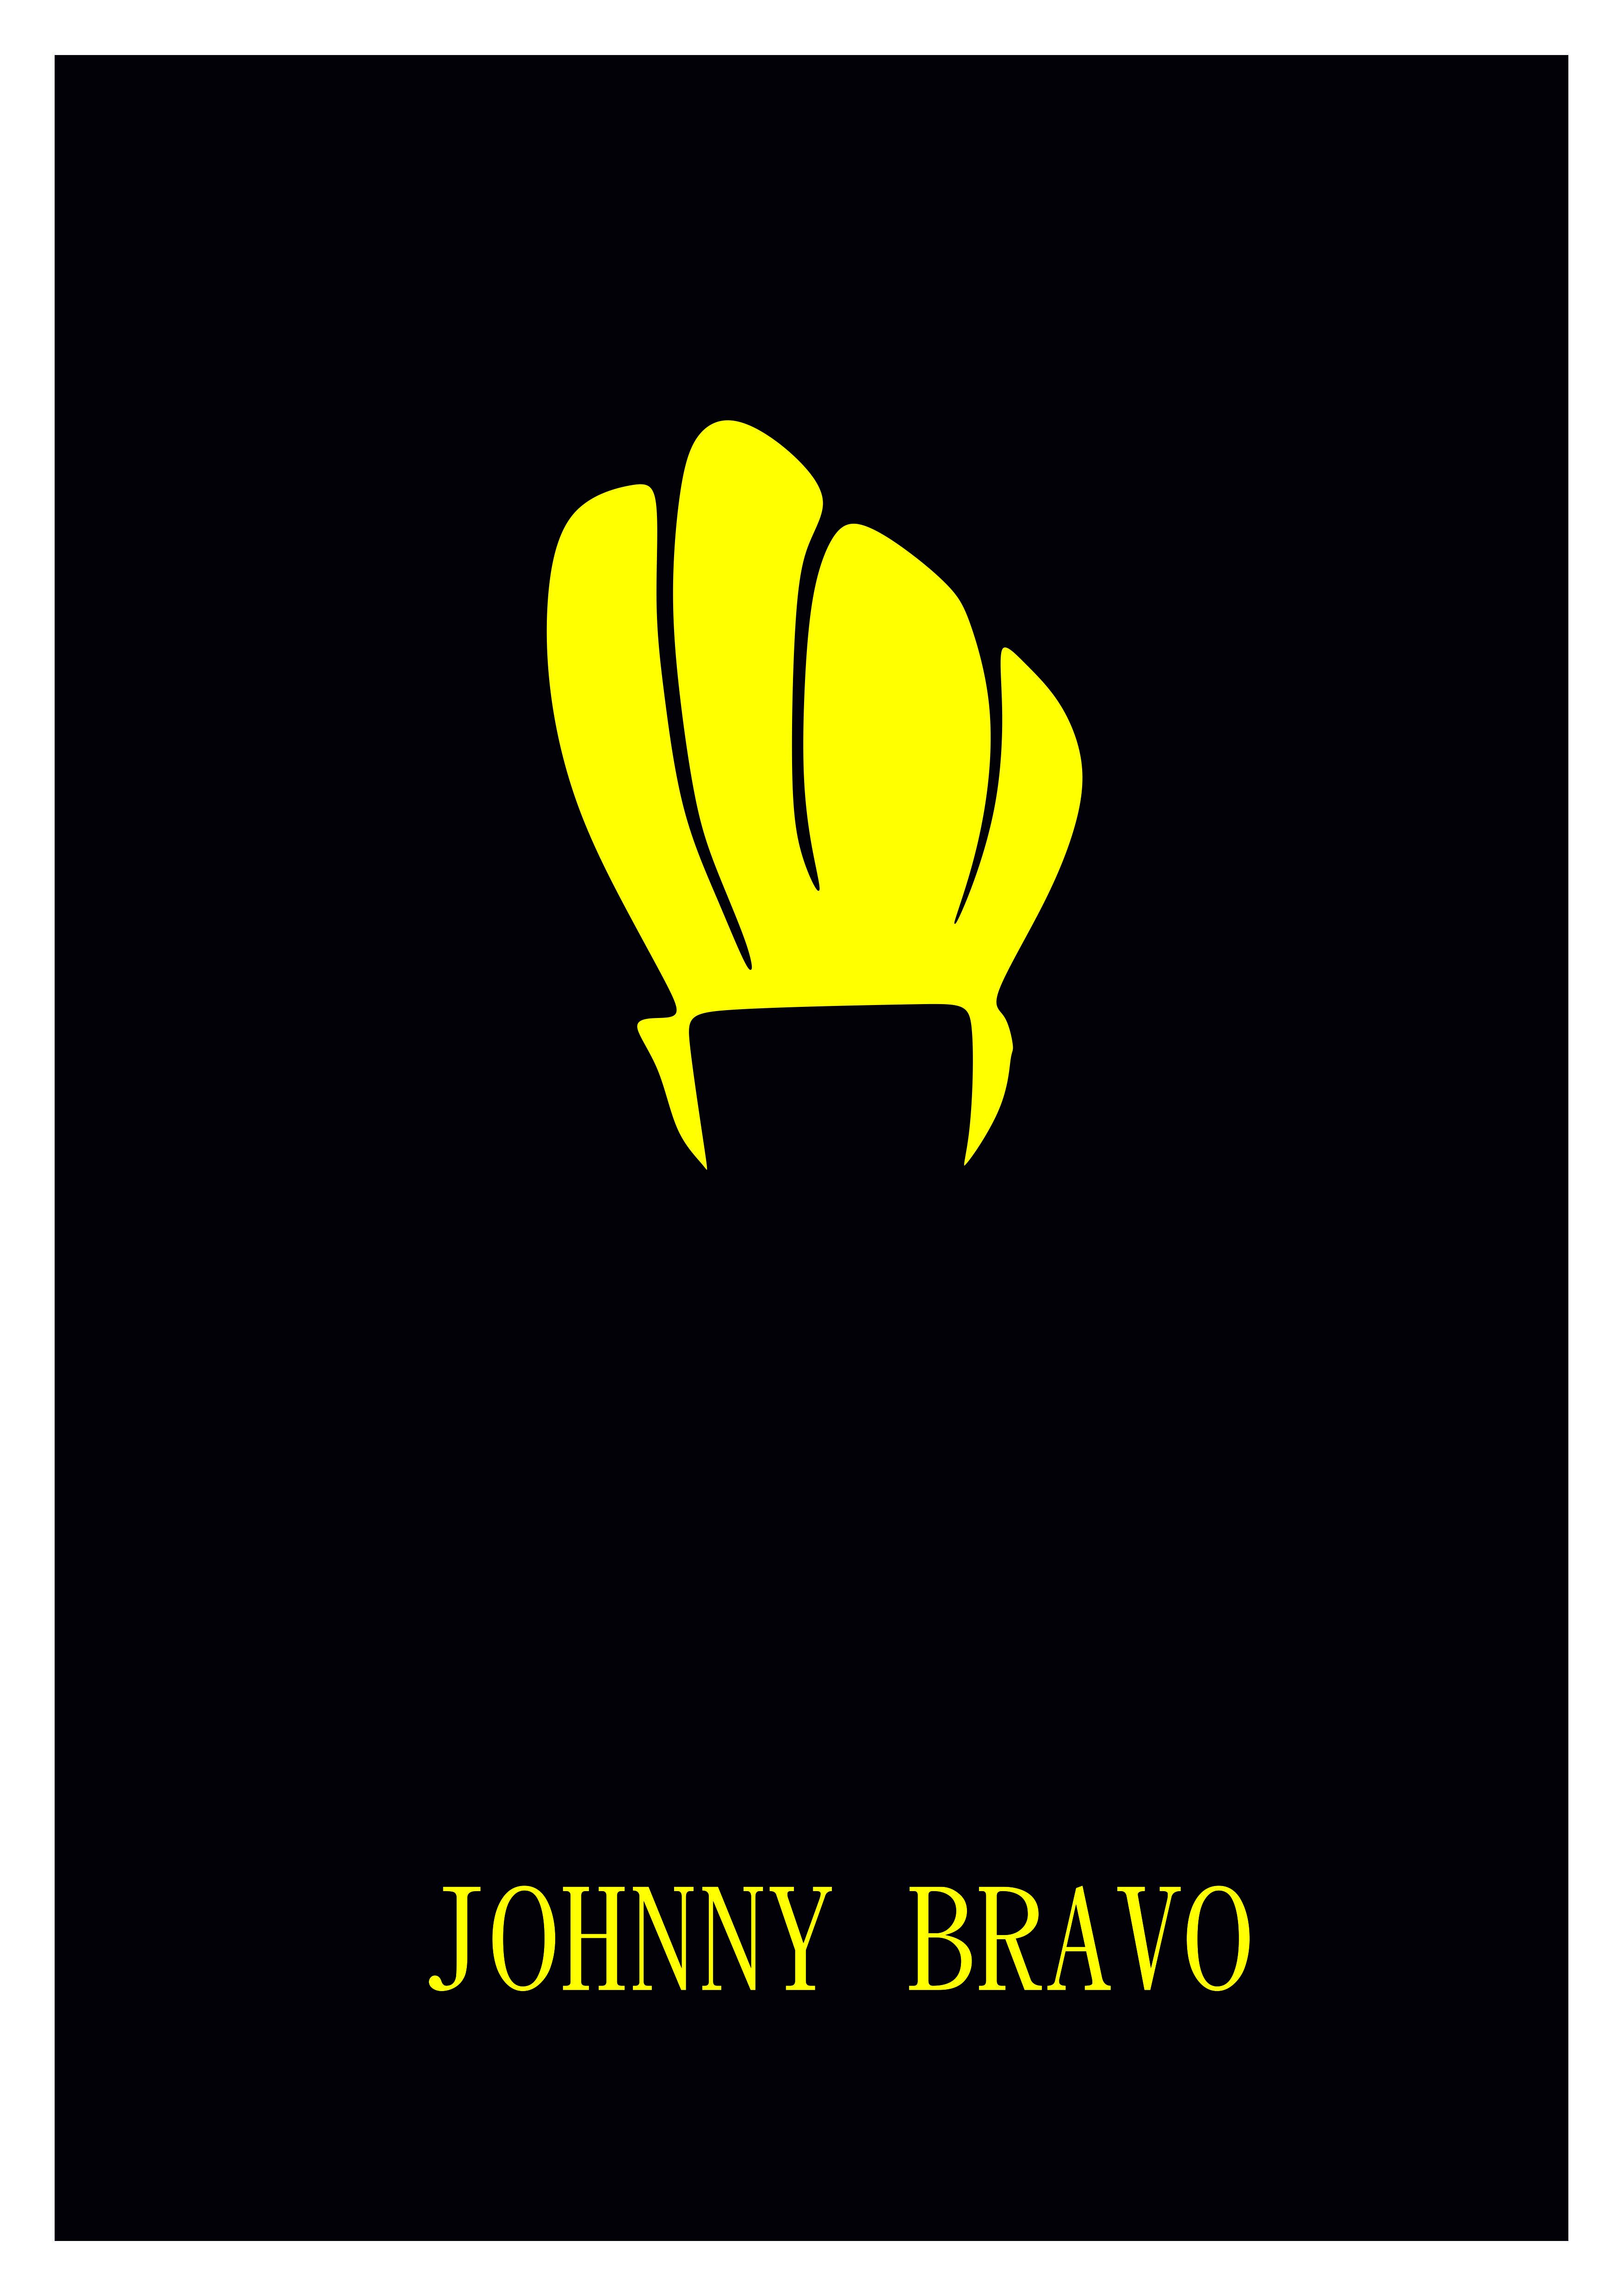 Johnny Bravo. Desierto Studios (Óscar Sola)